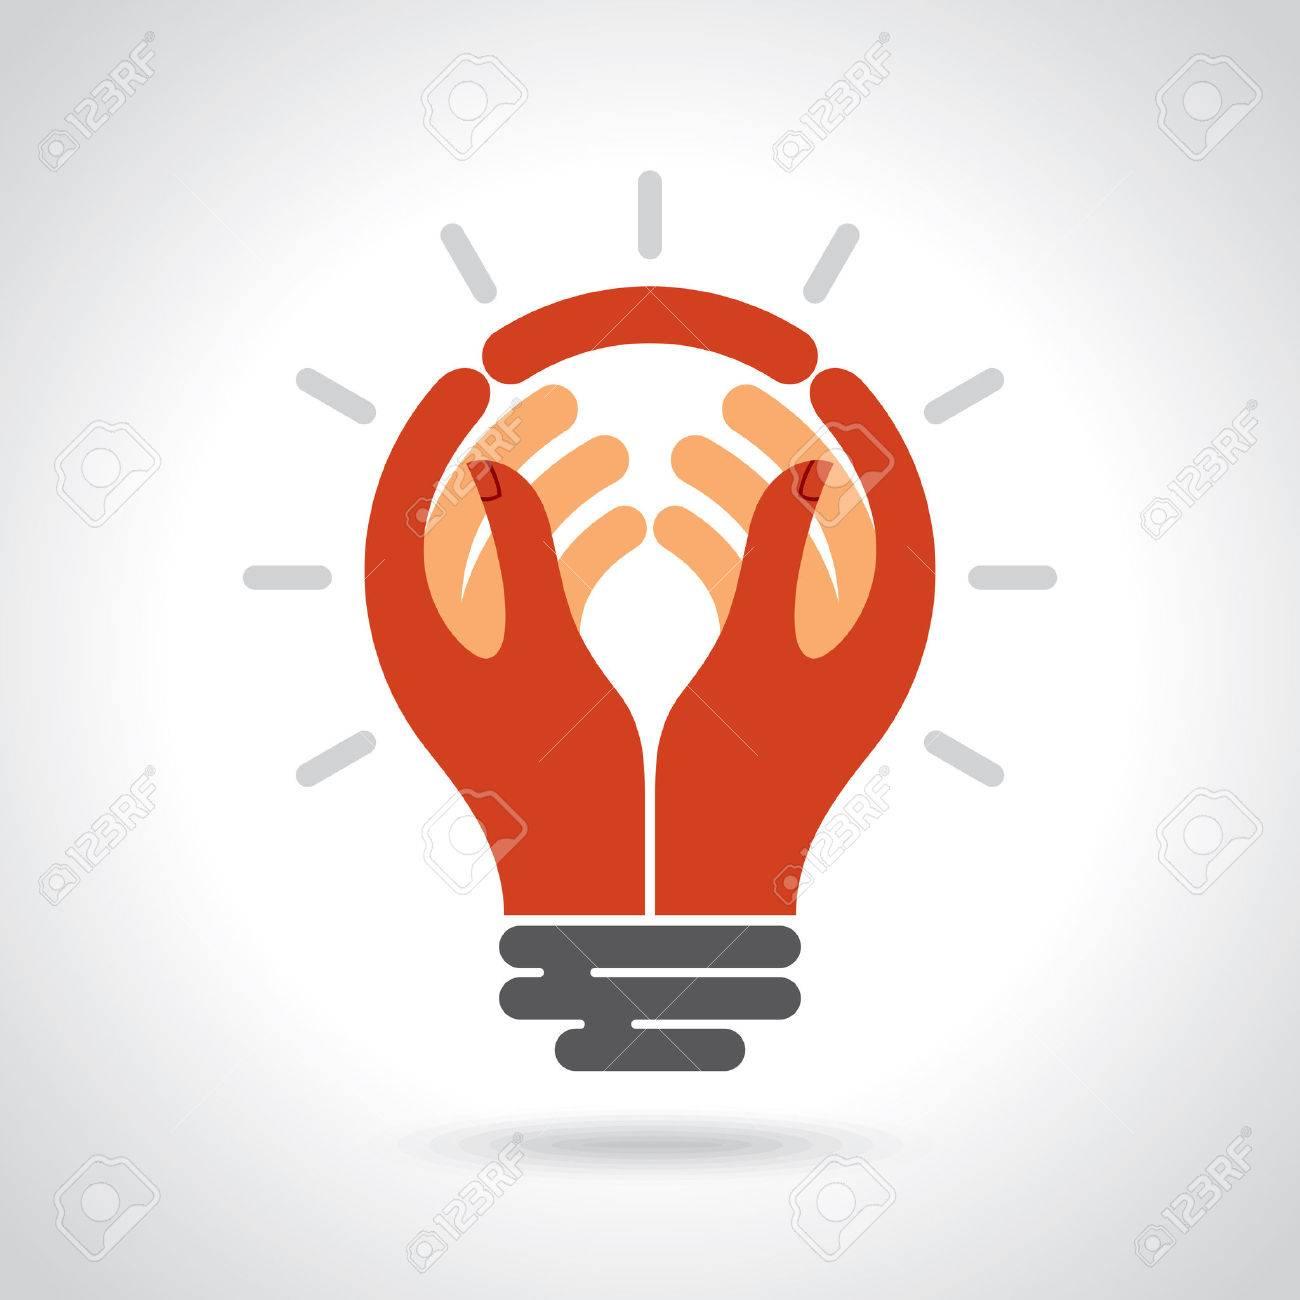 Reach idea with human hand Standard-Bild - 37076391